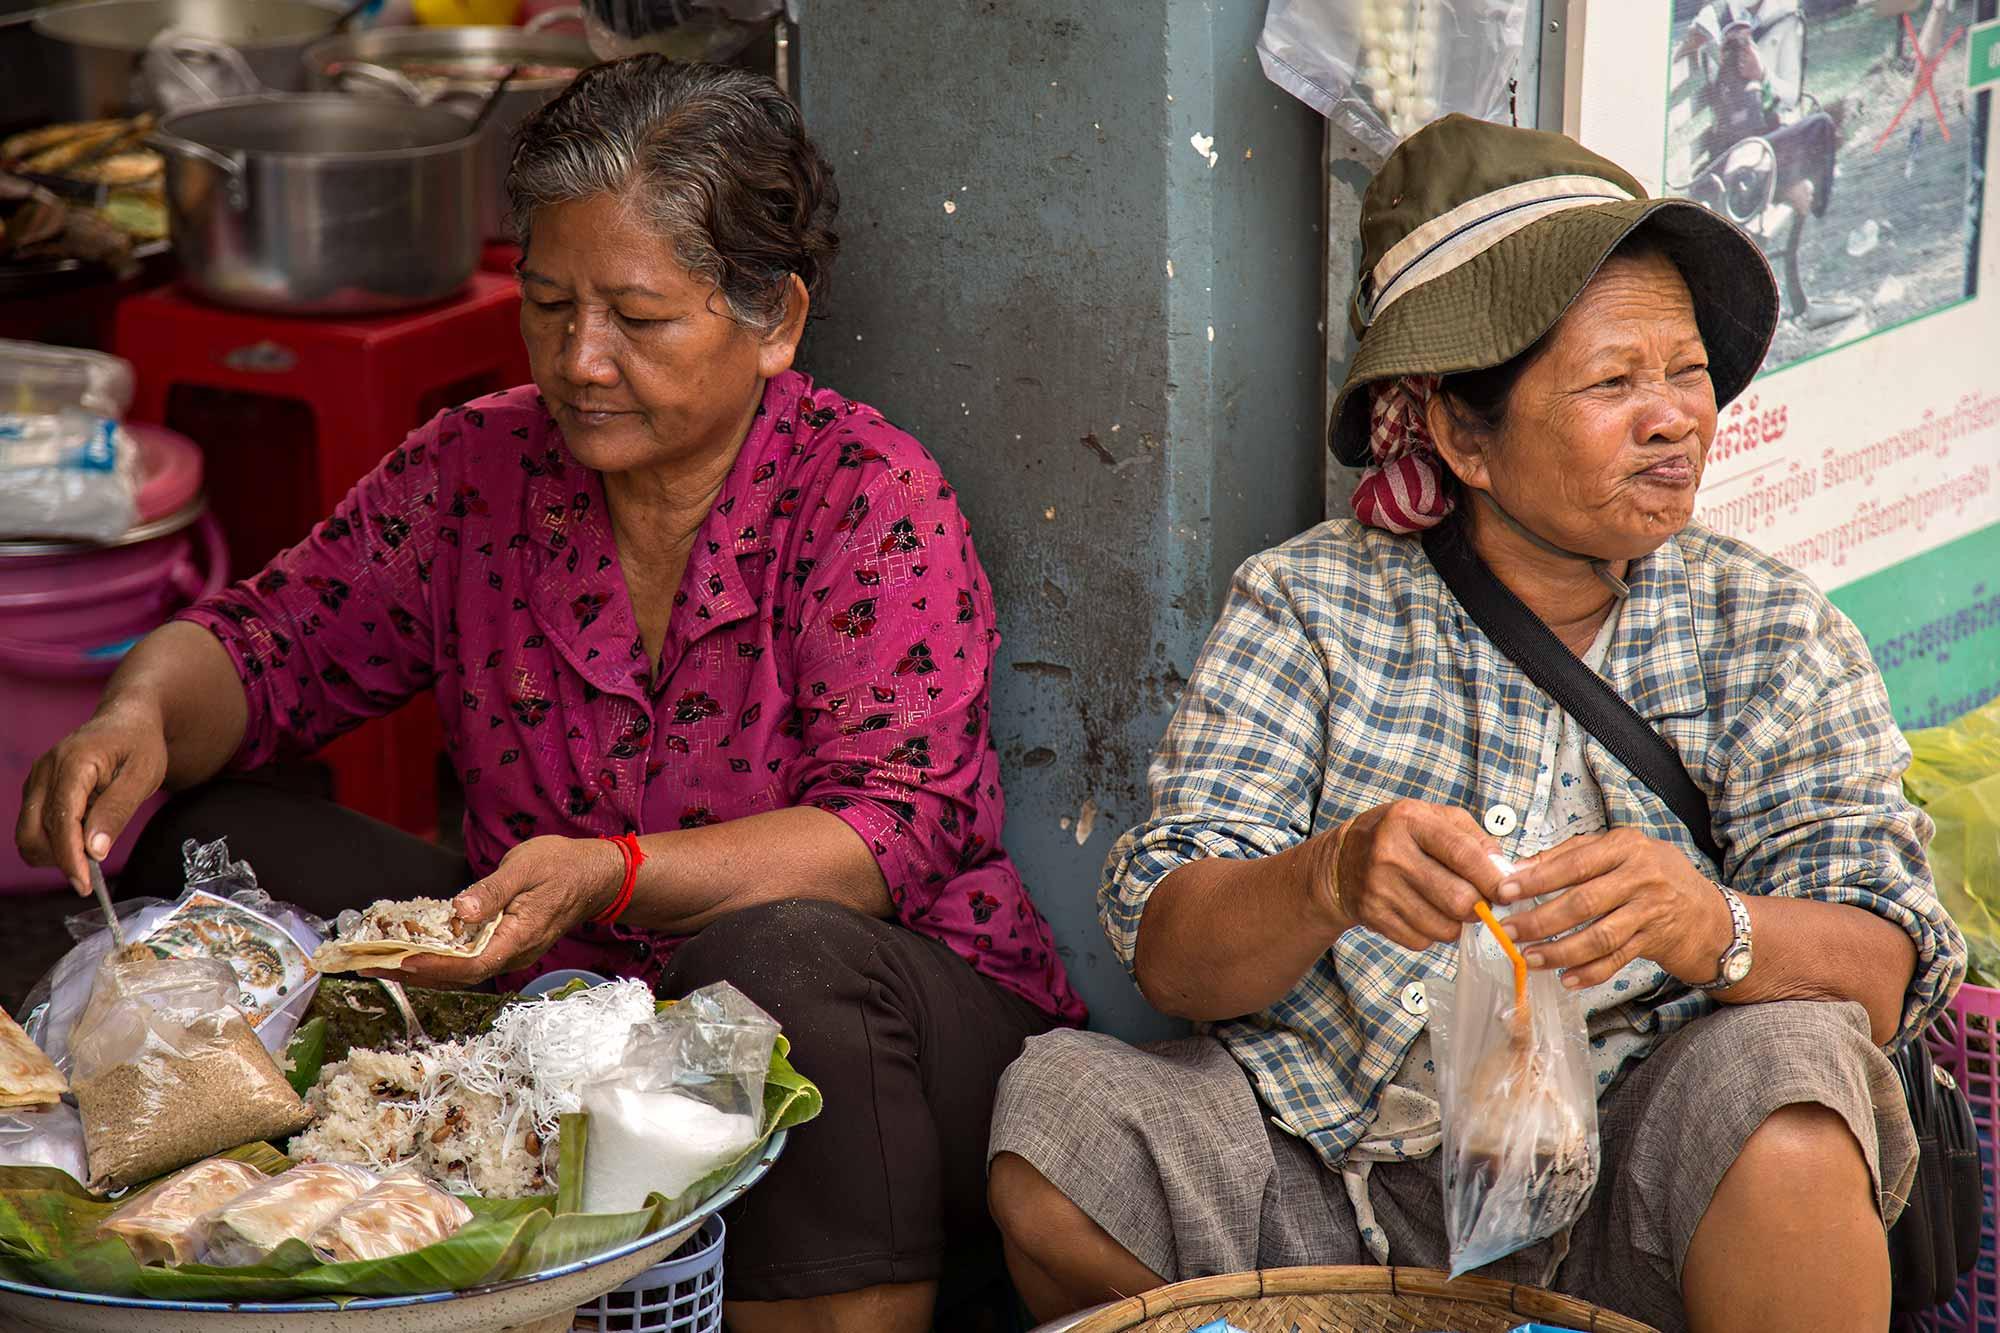 Streets vendors at Phsar Thmei market in Phnom Penh, Cambodia. © Ulli Maier & Nisa Maier